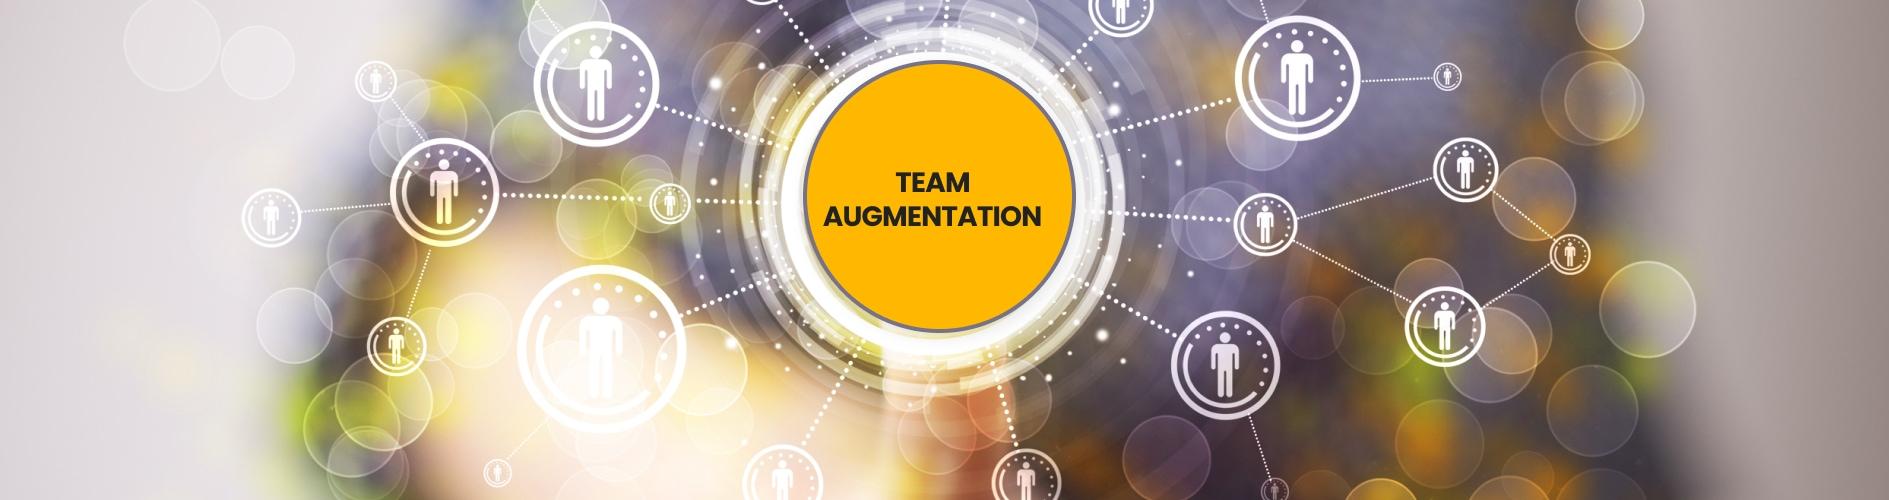 team augmentation